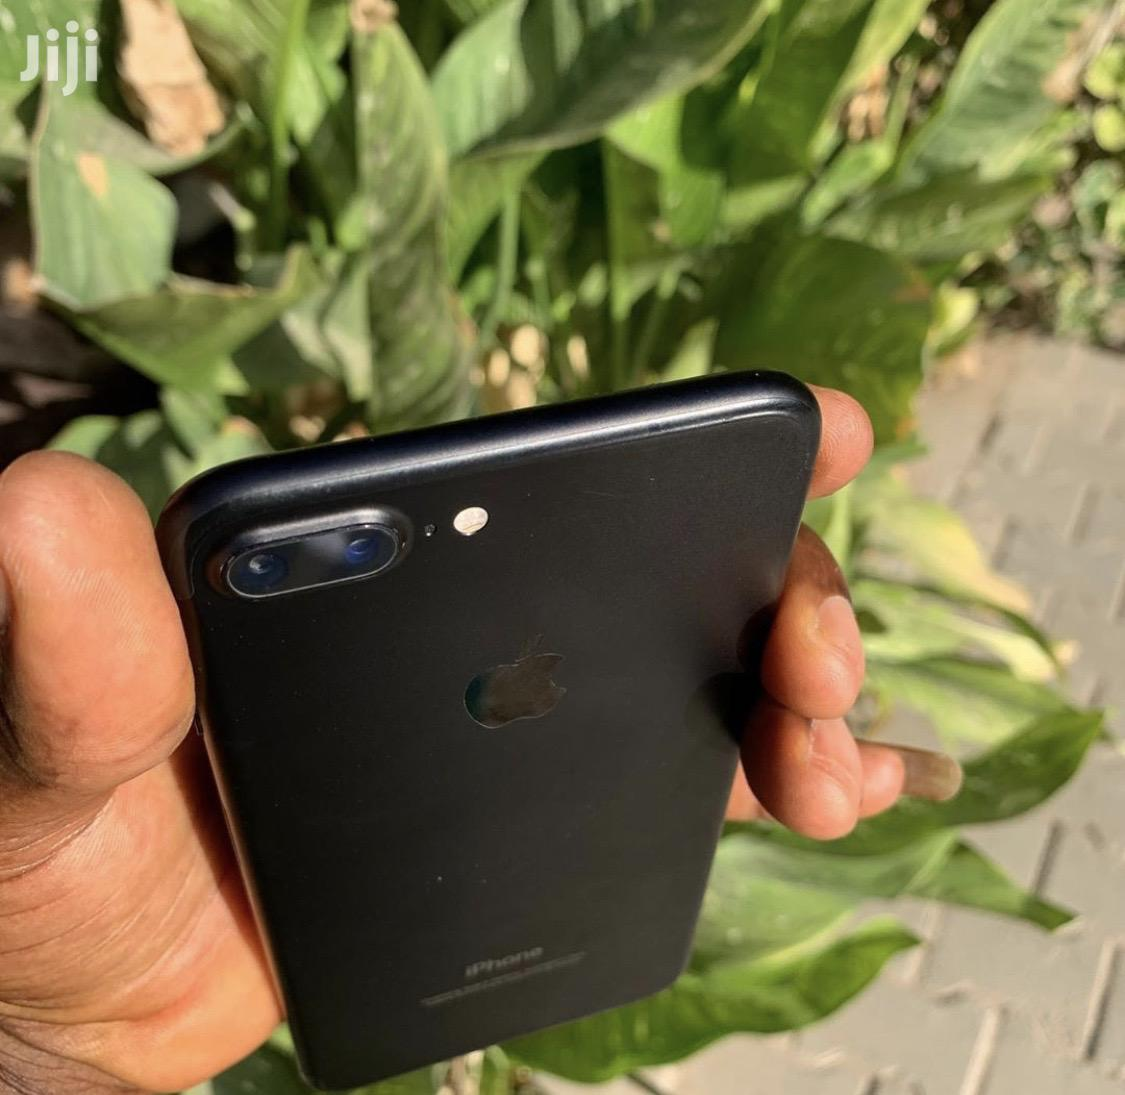 Apple iPhone 7 Plus 32 GB Black | Mobile Phones for sale in Kampala, Central Region, Uganda